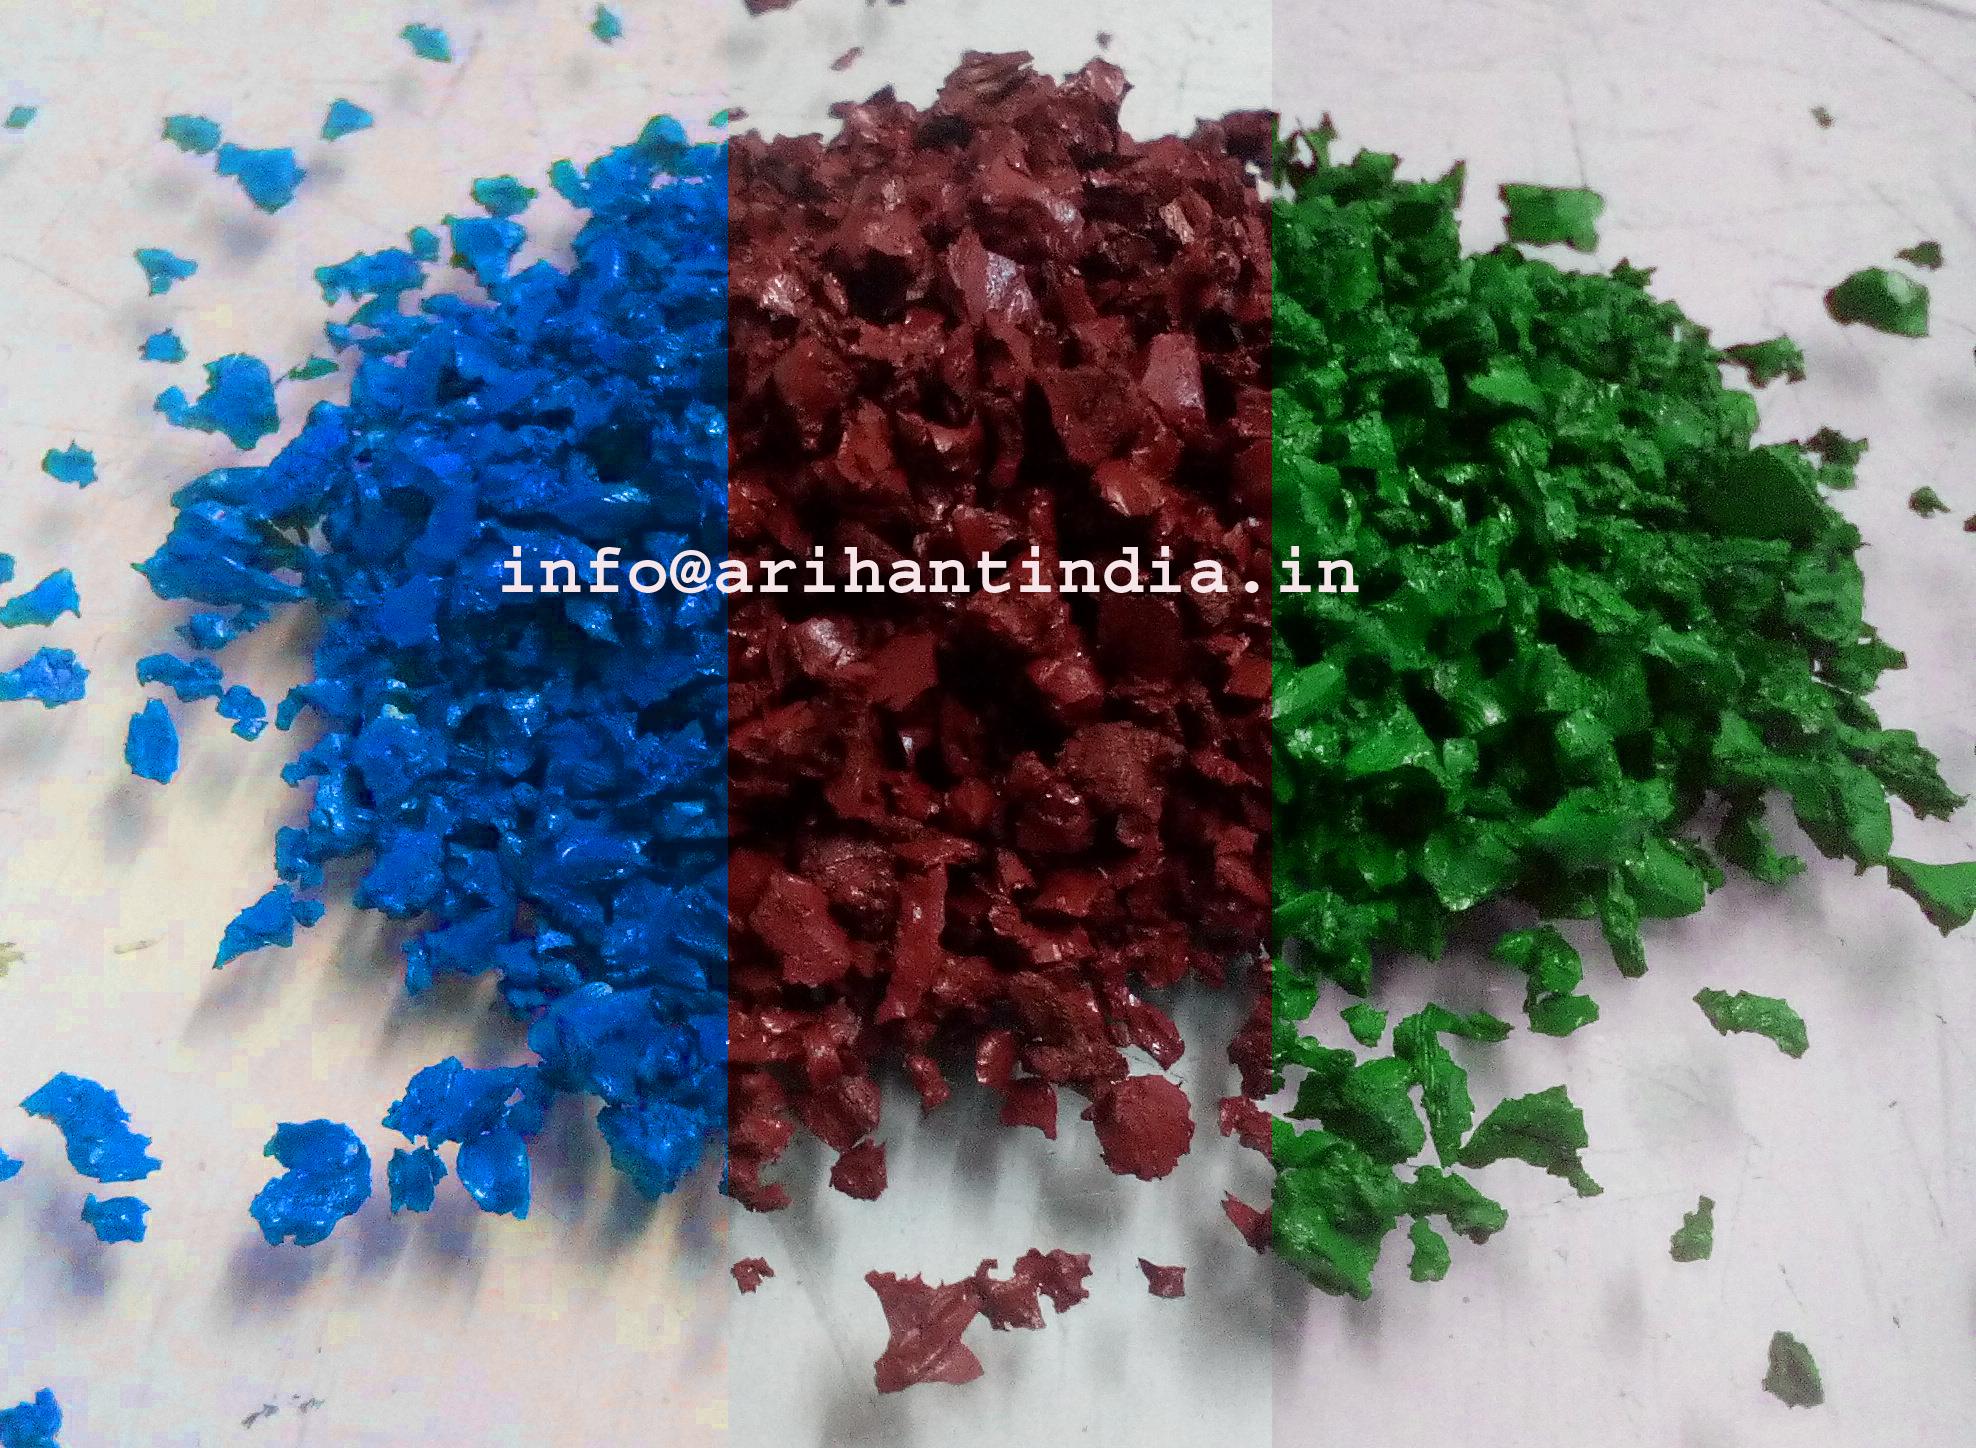 Arihant Oil & Chemicals +91-9899447115